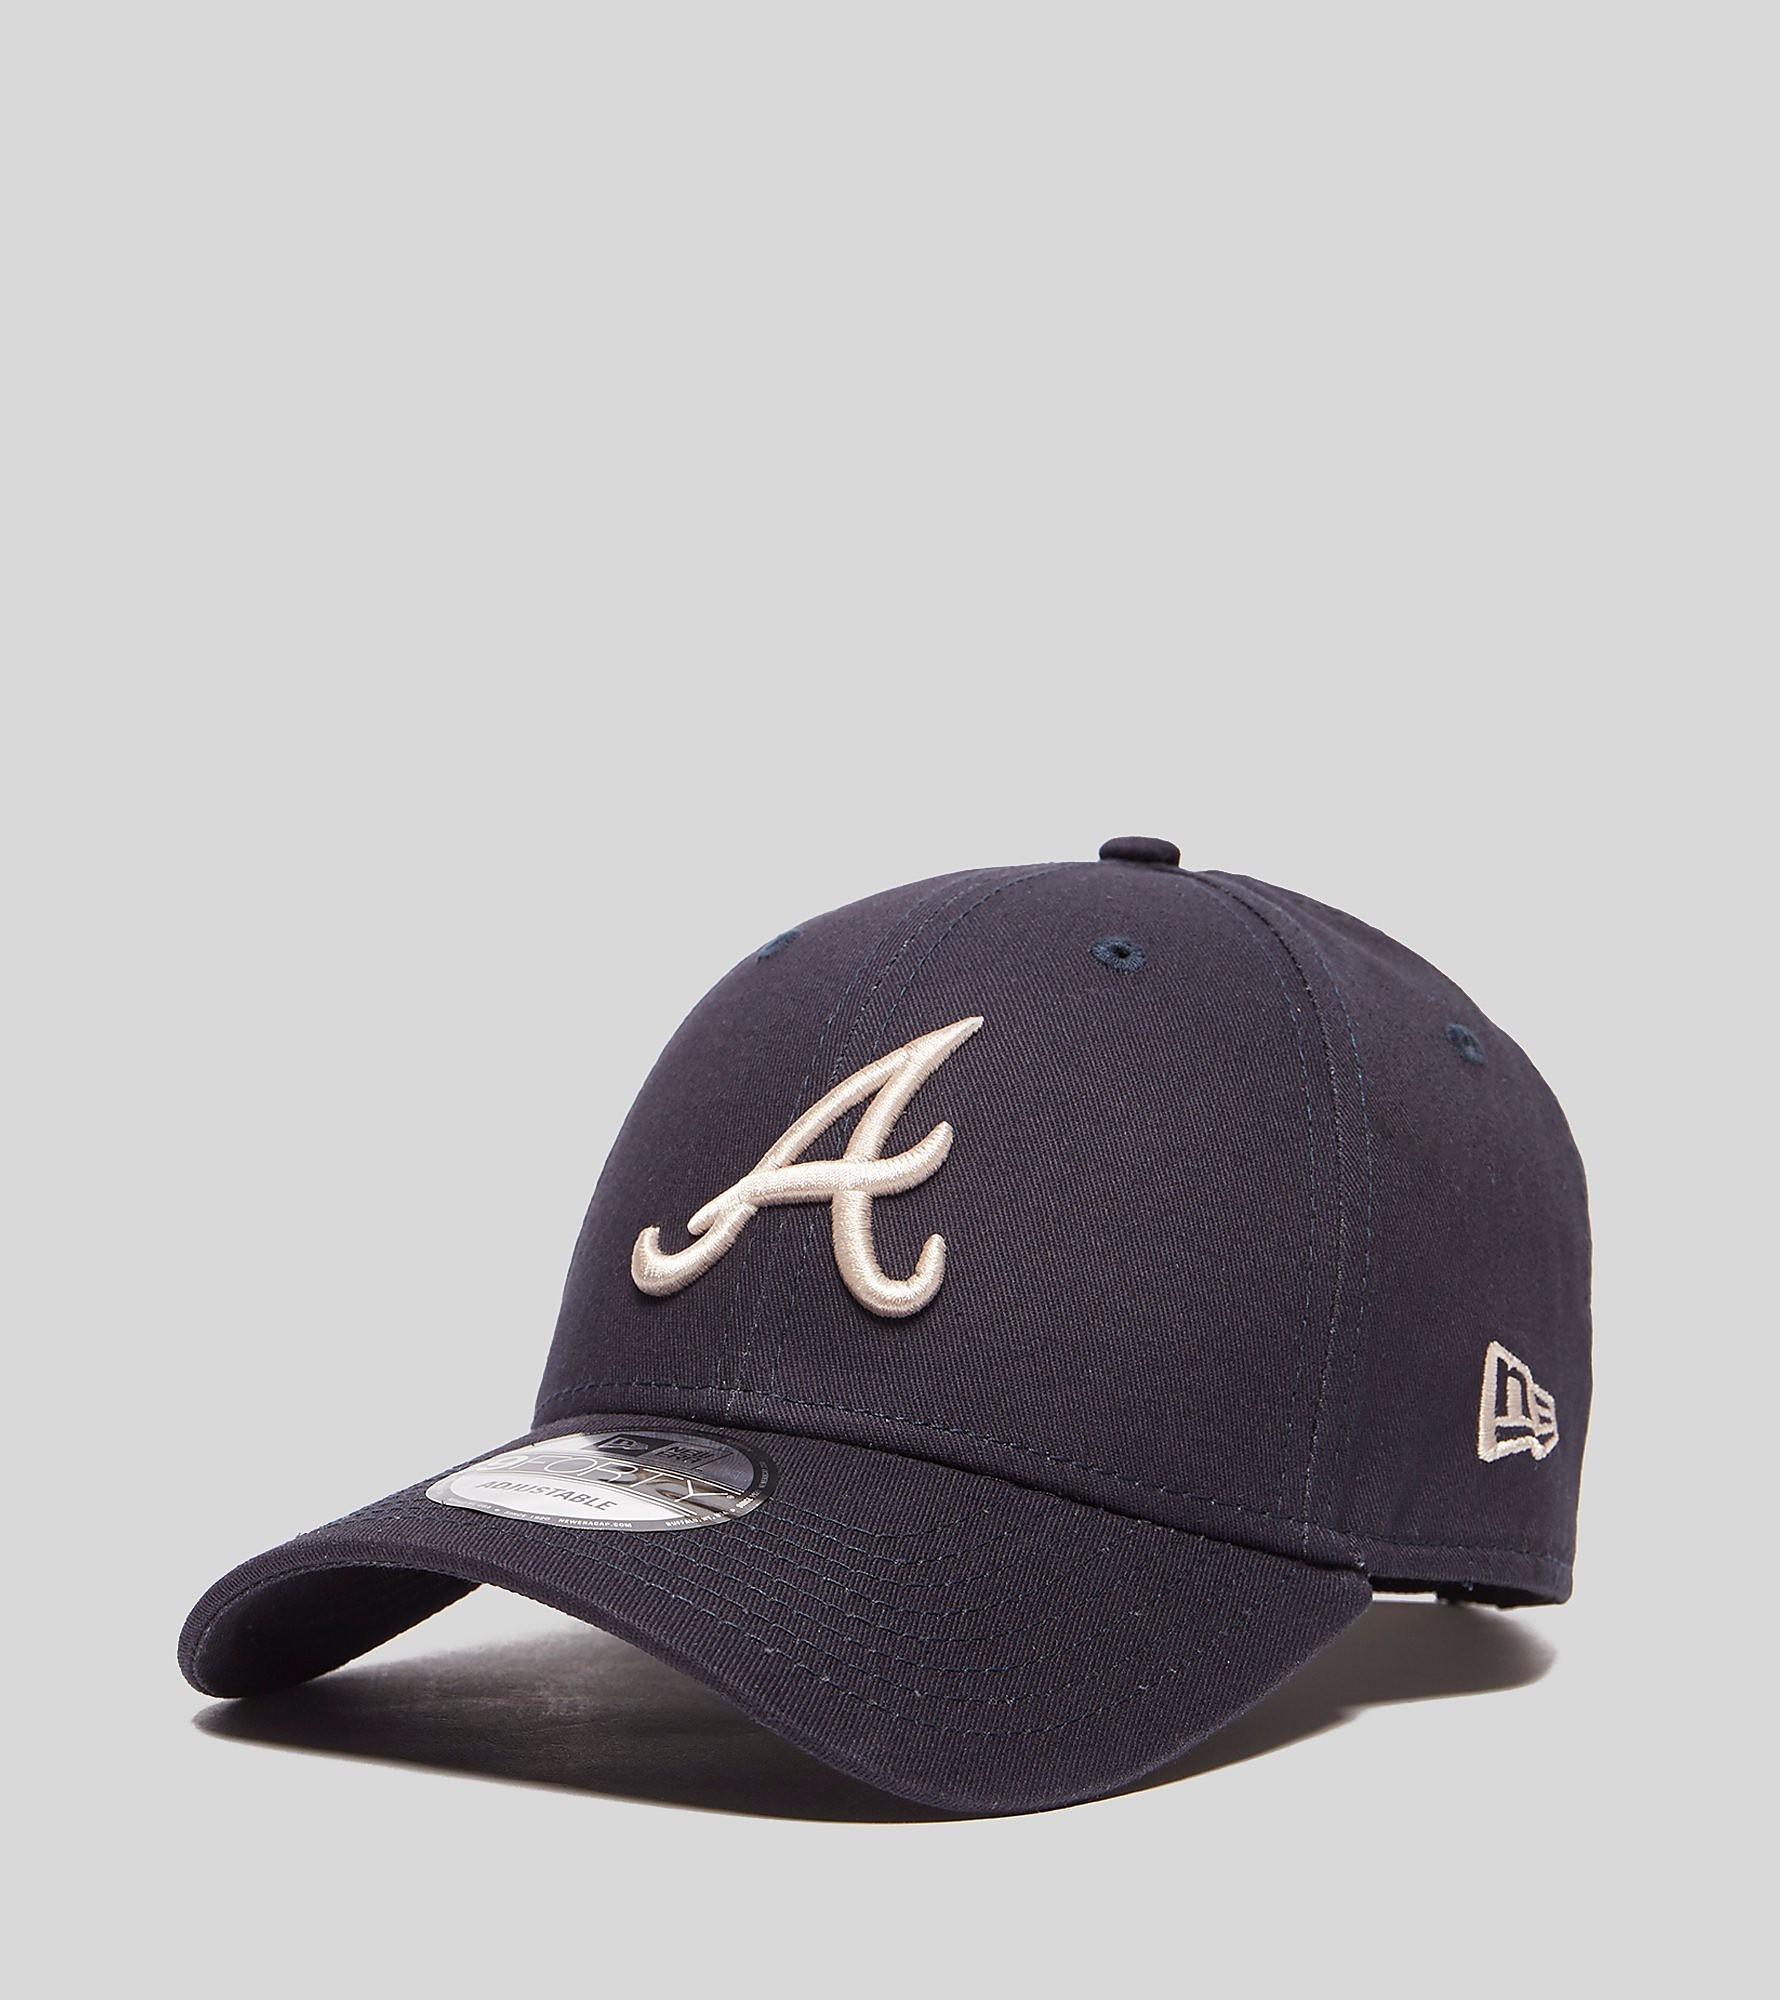 New Era Casquette 9FORTY Atlanta Braves Cap